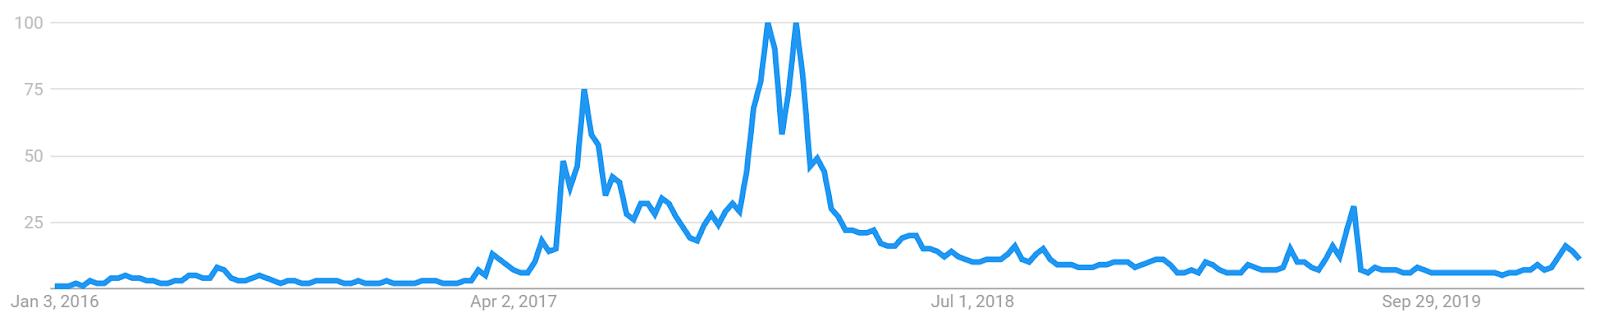 Ethereum Price Analysis 2 Mar 2020 (16)